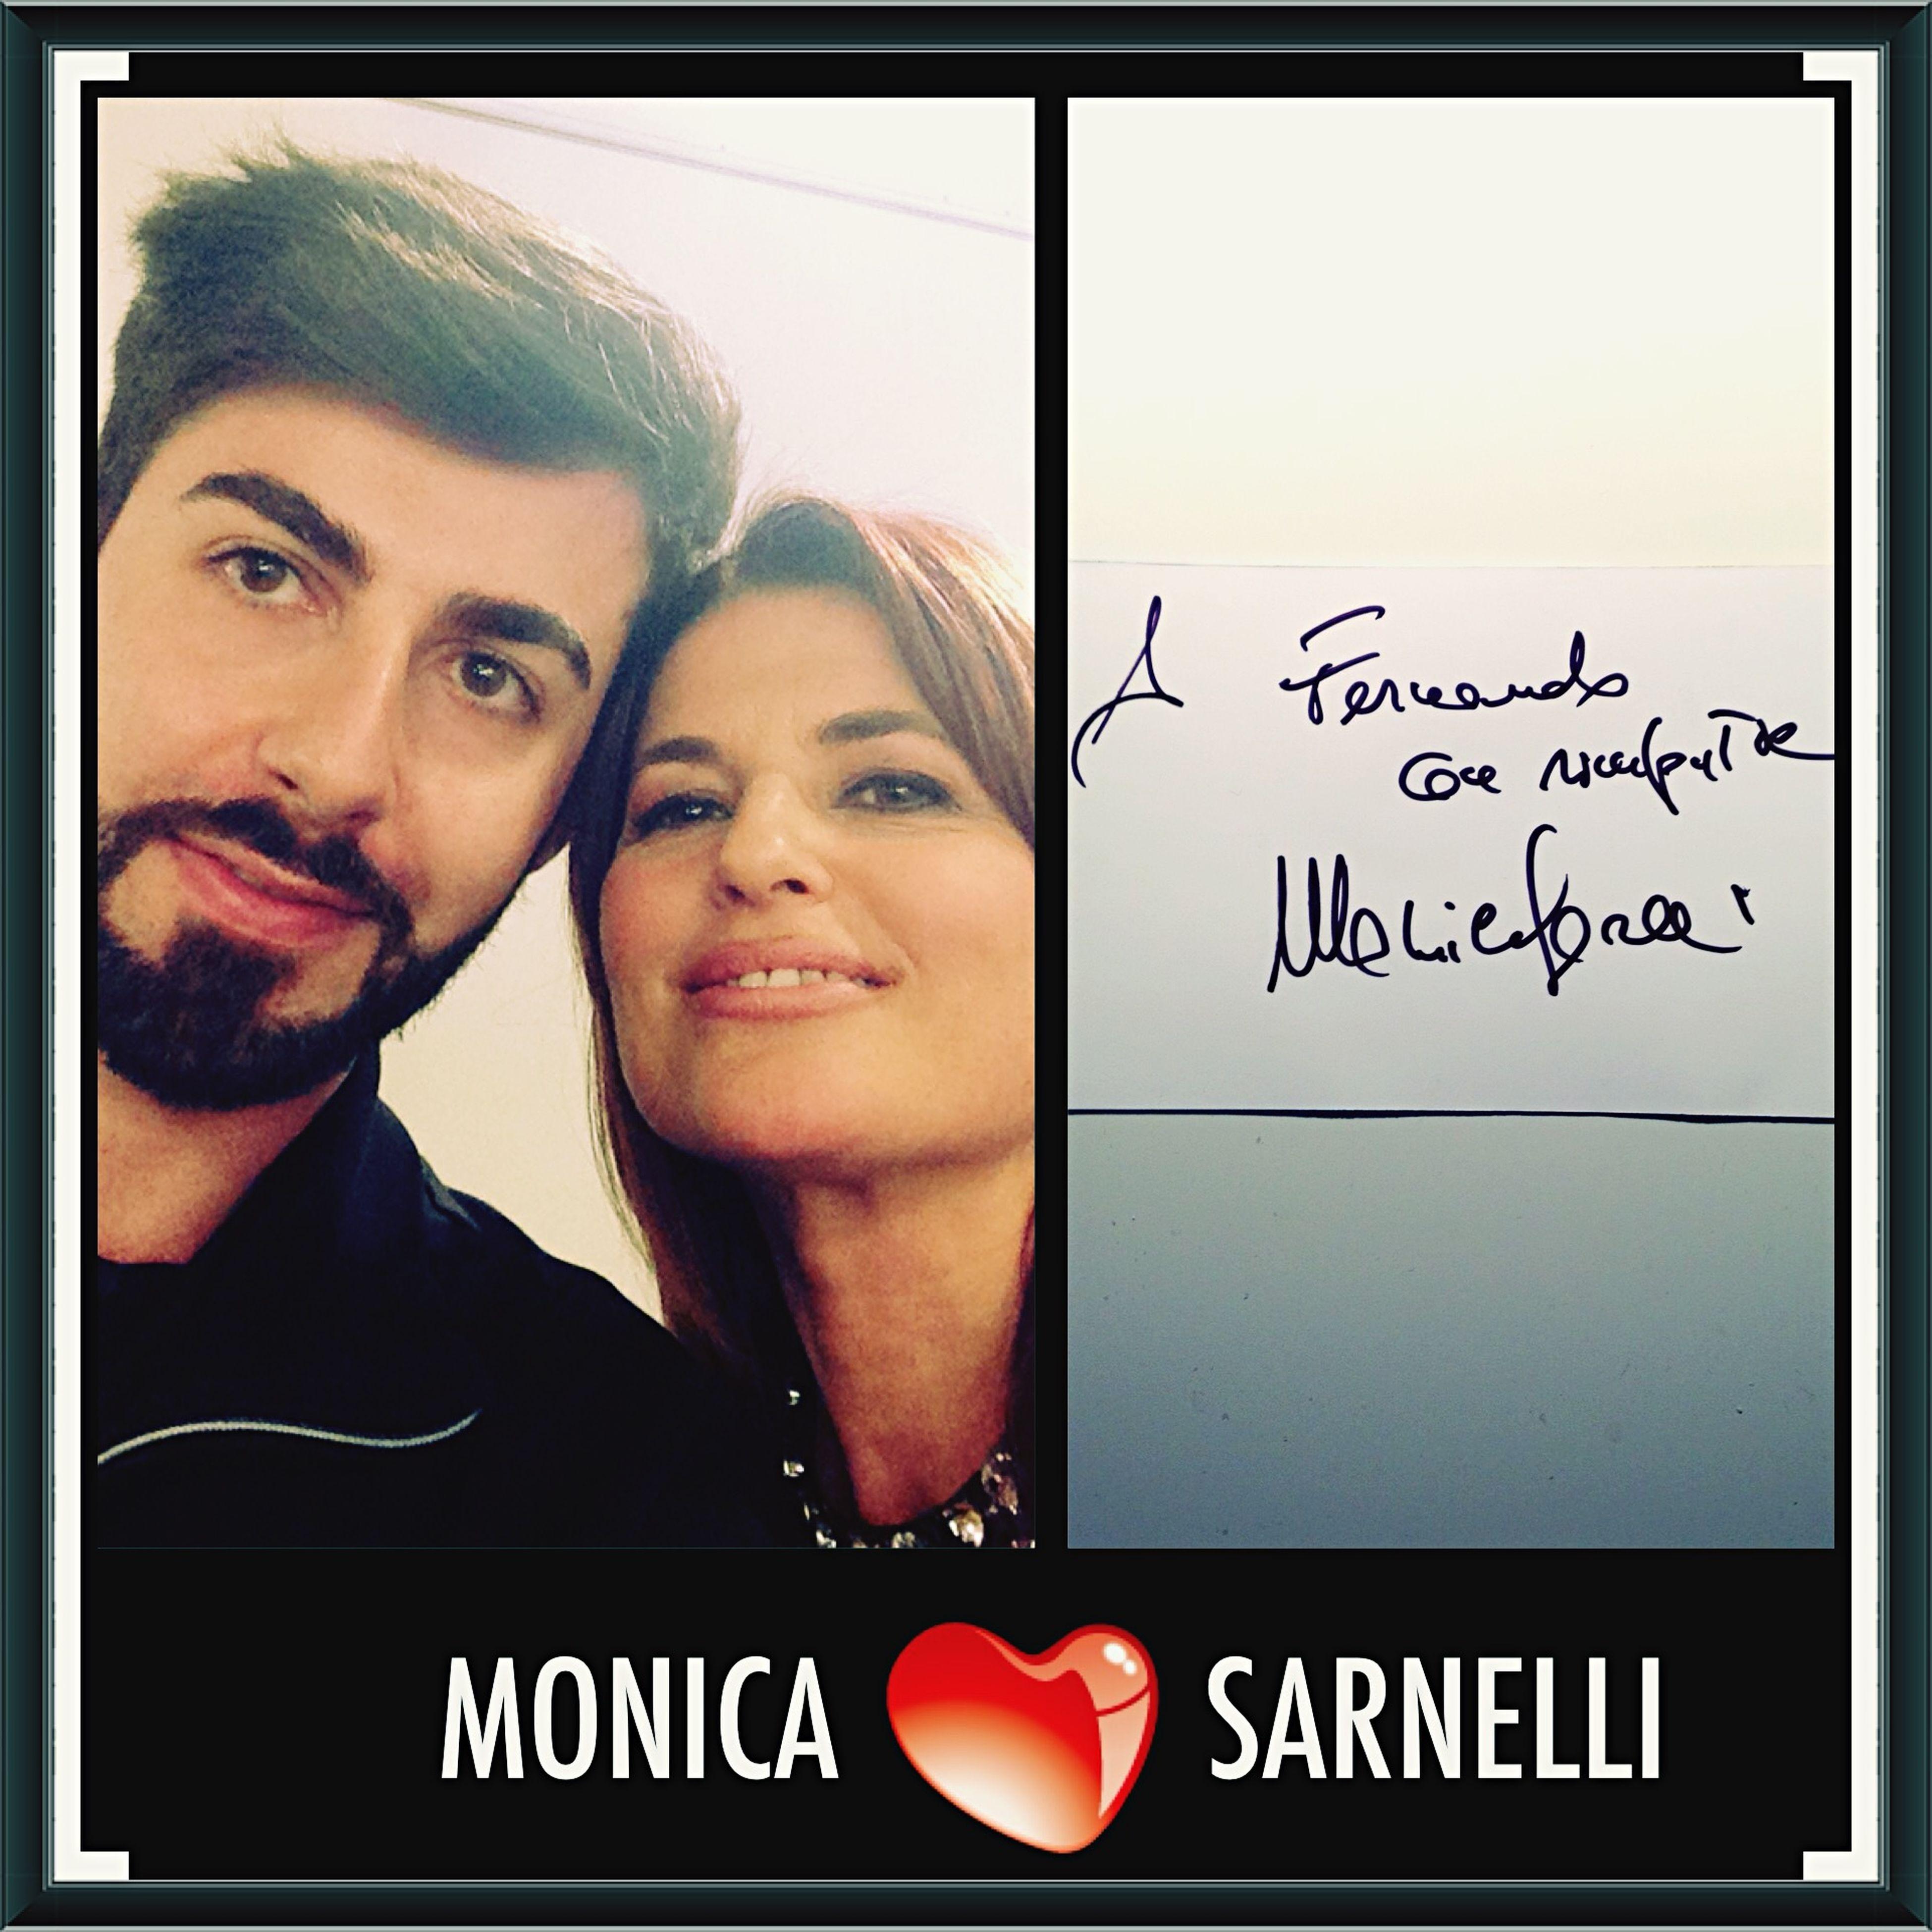 """Addo' staie dinta quale ammore t'annascunne ChestaSera 🌙 ca je vulesse sull'a tte."" 💌 💌 Grazie Monica Sarnelli ❤ ☺️"